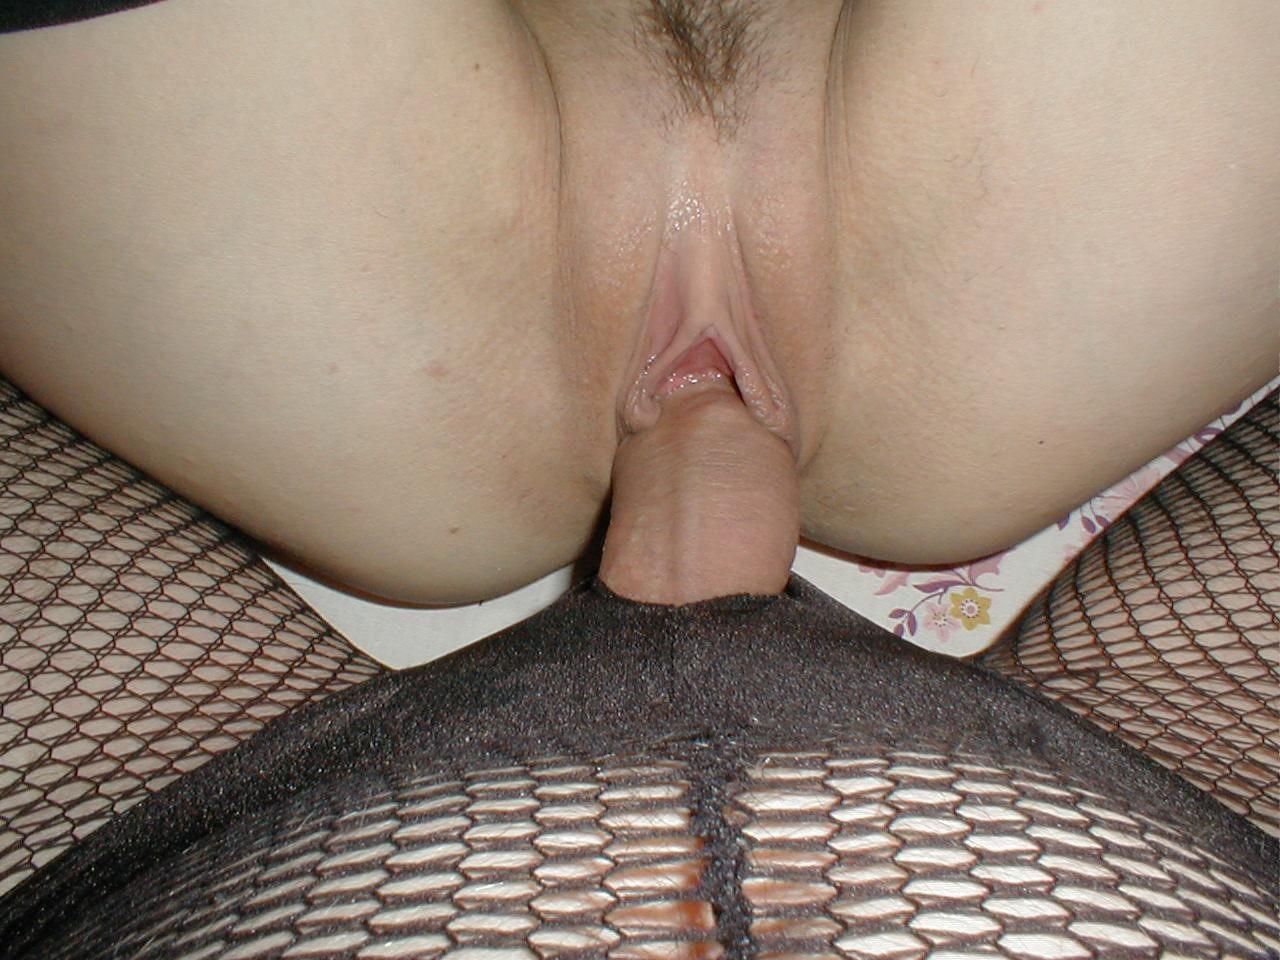 http://pbs-2.adult-empire.com/85/8570/020/pic/2.jpg